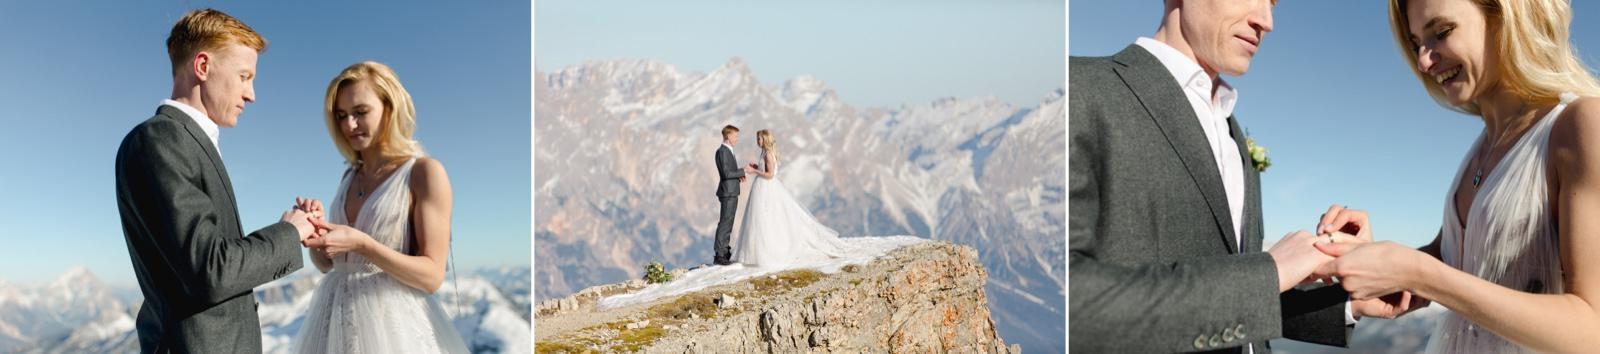 Adventurous Dolomites Elopement Wedding Fotomagoria21.jpg